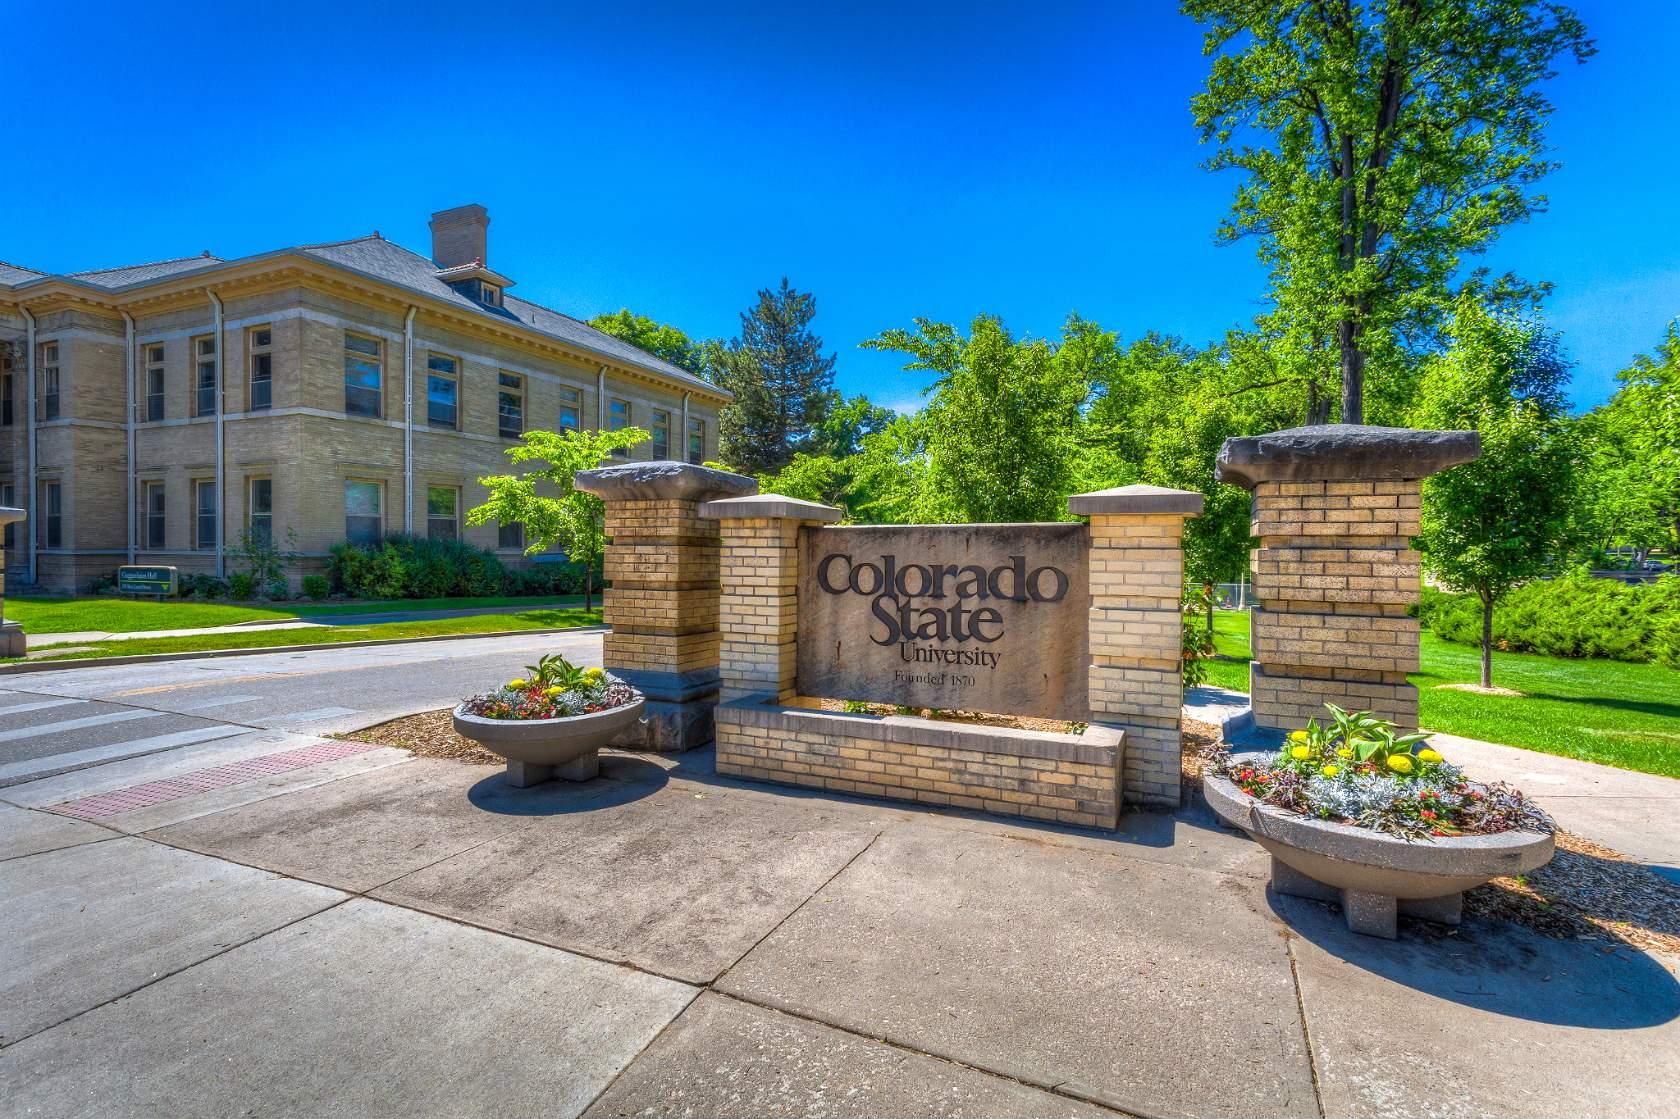 10 Hardest Courses at Colorado State University